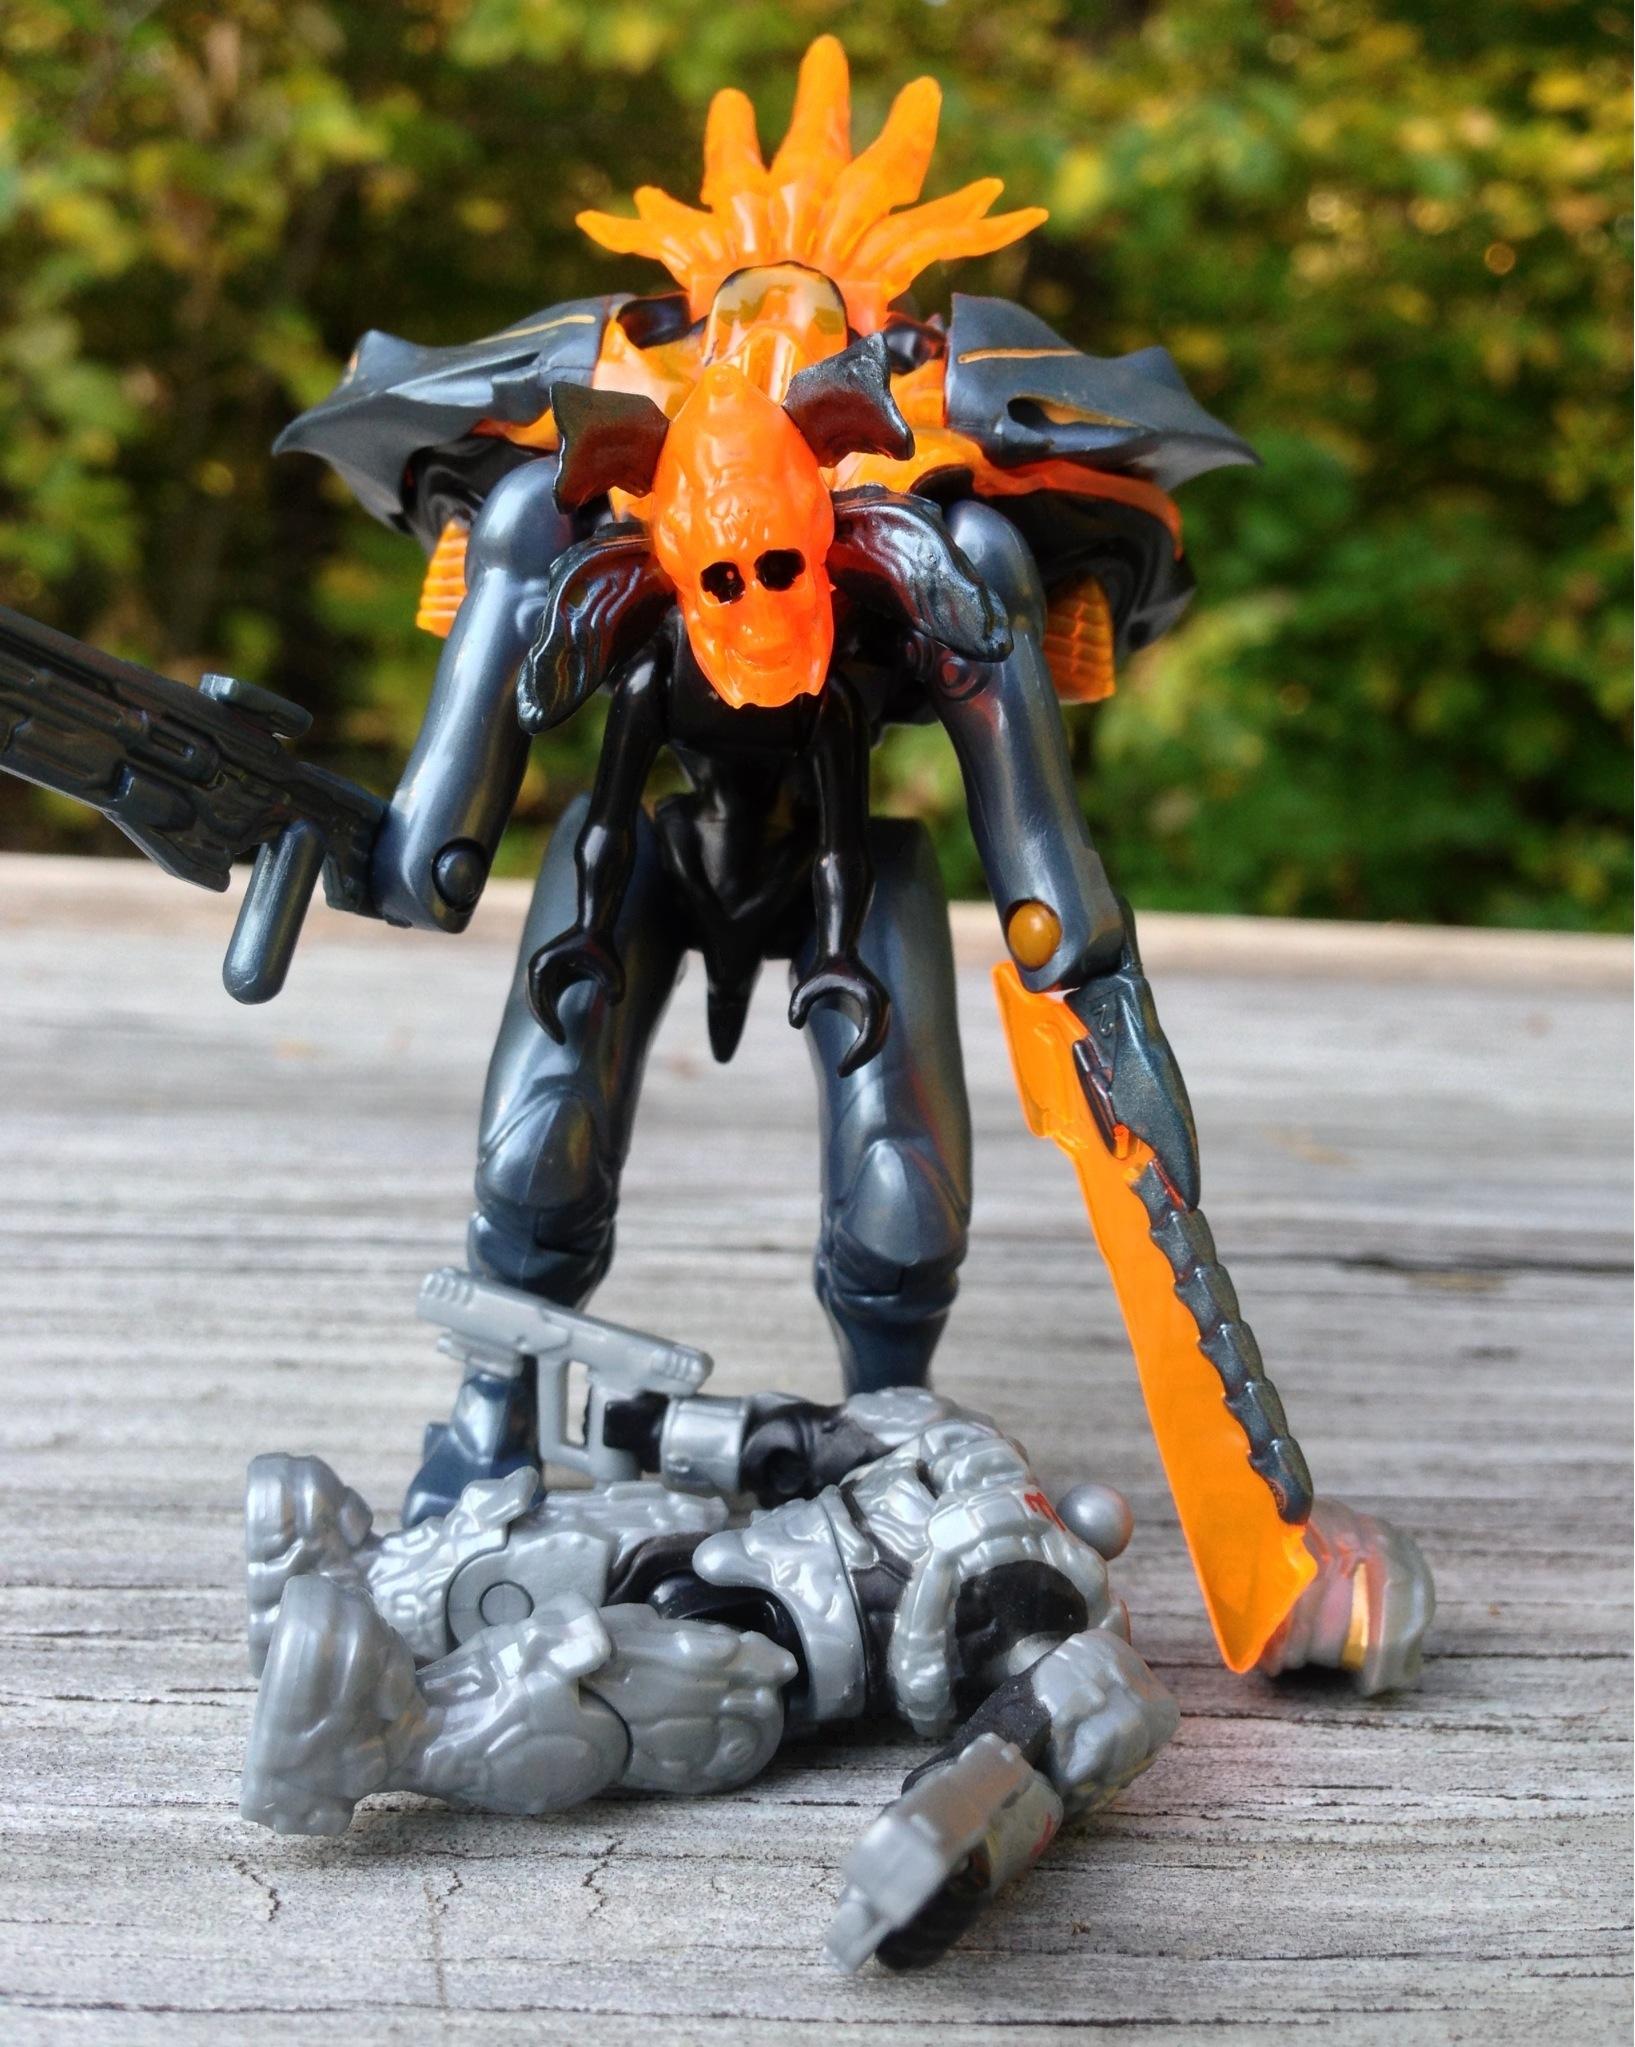 Zabawki konstrukcyjne MEGA Blocks Halo Mega Bloks Set #97134